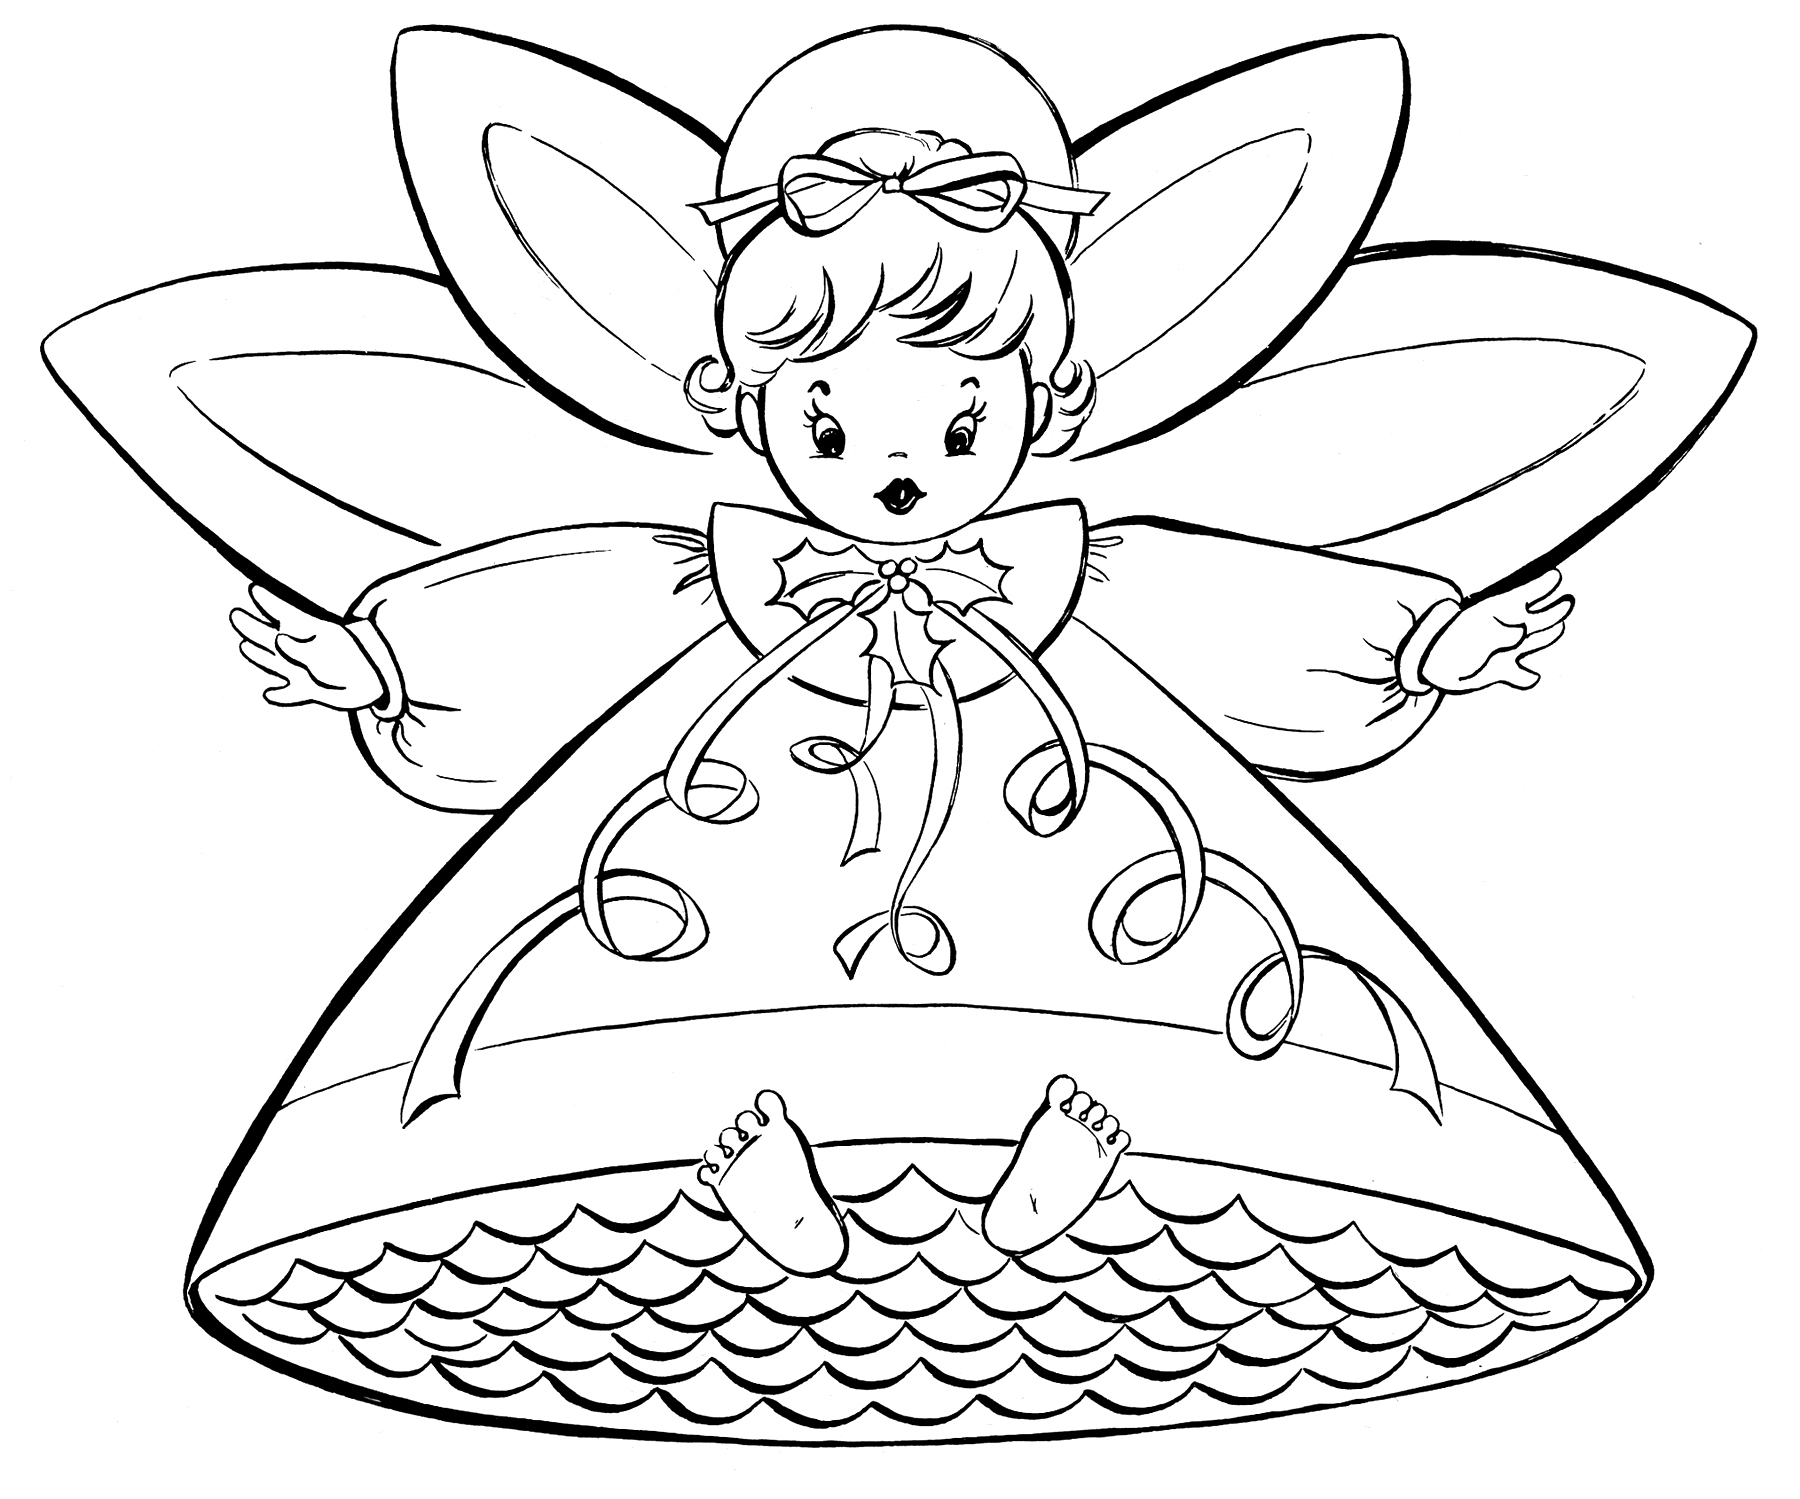 Dibujos De Angelitos De Navidad. Affordable Interesting With Dibujos ...